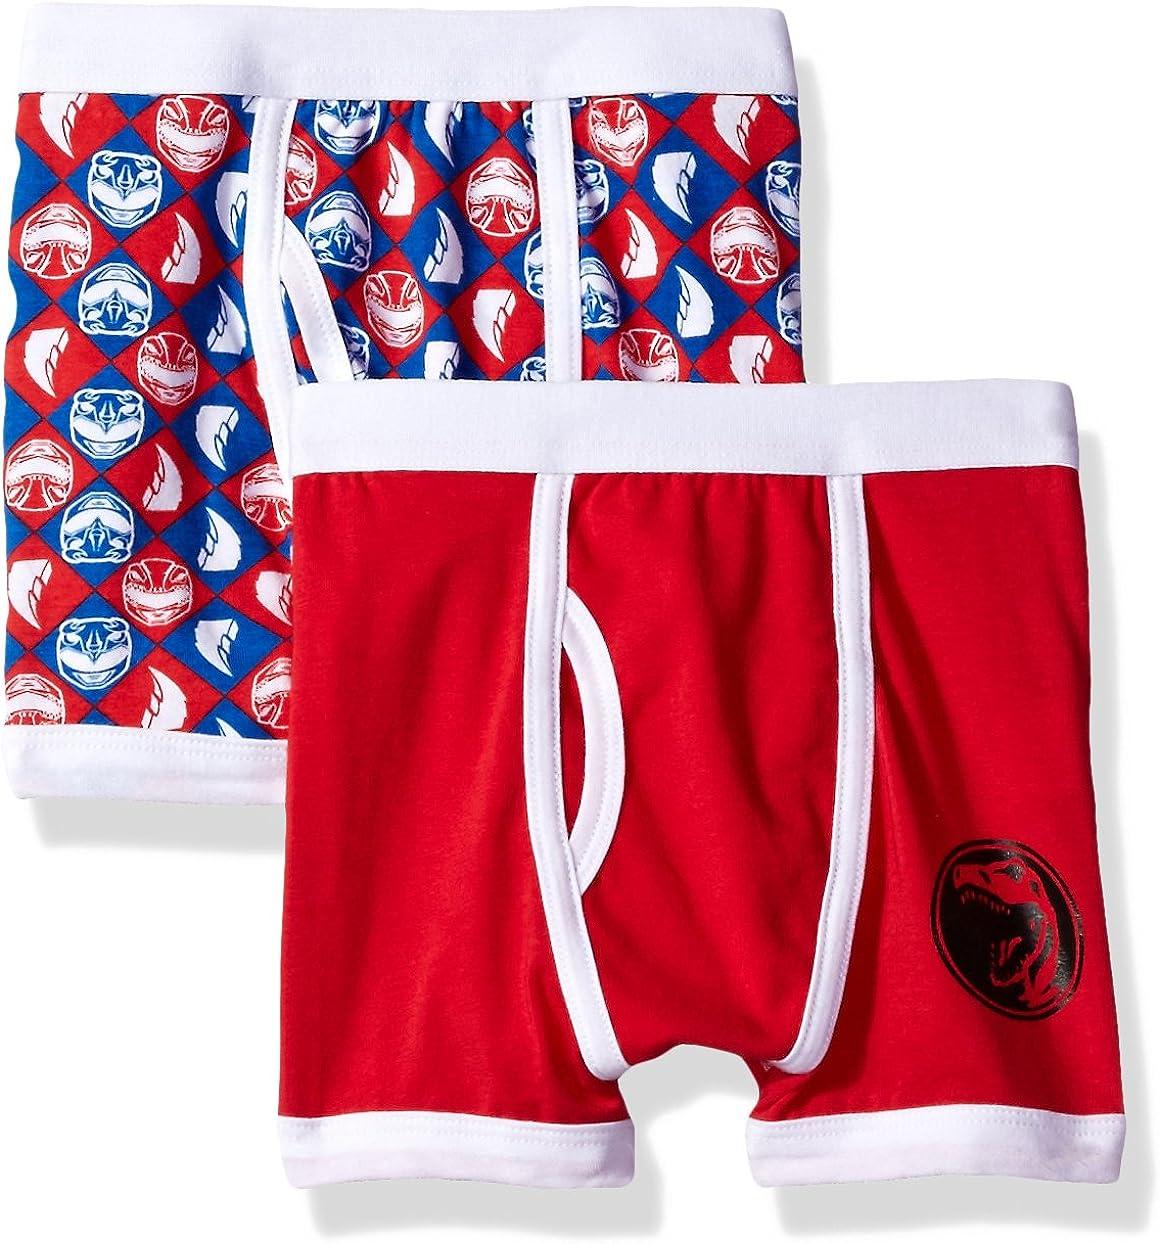 Power Rangers boys Red 2 Underwear Award-winning store Ranger San Diego Mall Pack